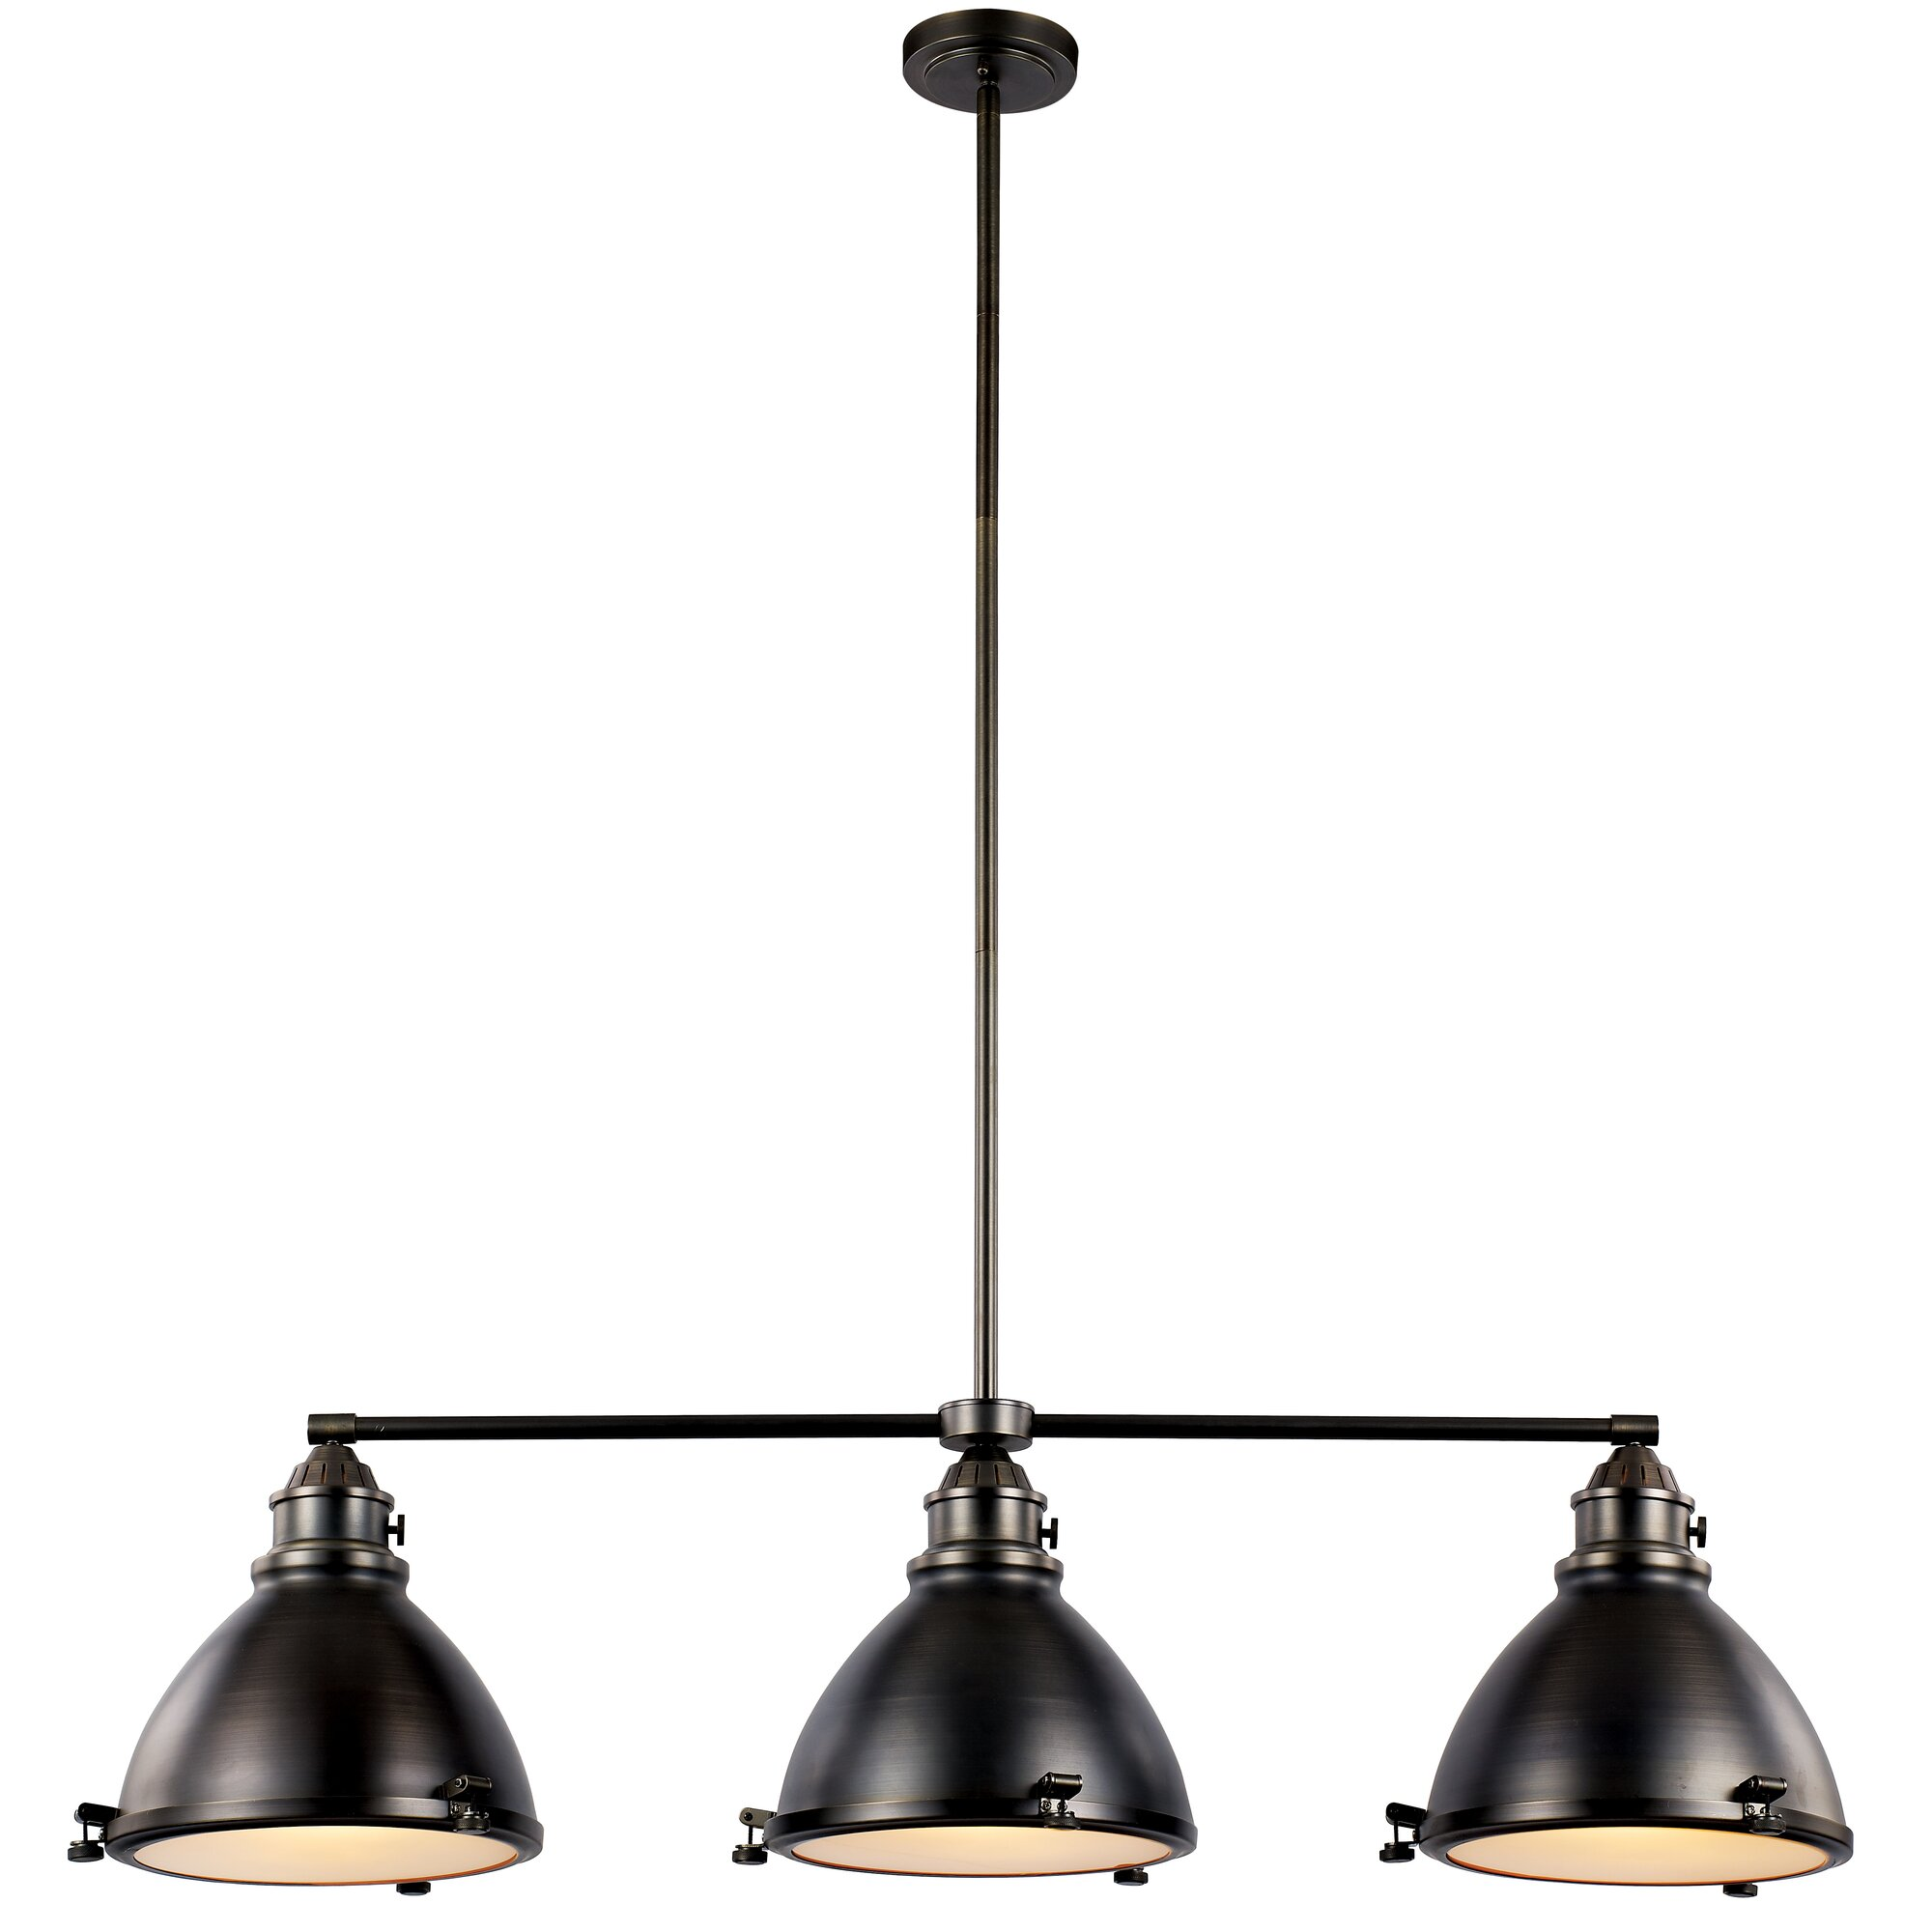 Laurel foundry modern farmhouse dewey 3 light kitchen for Modern kitchen light pendants